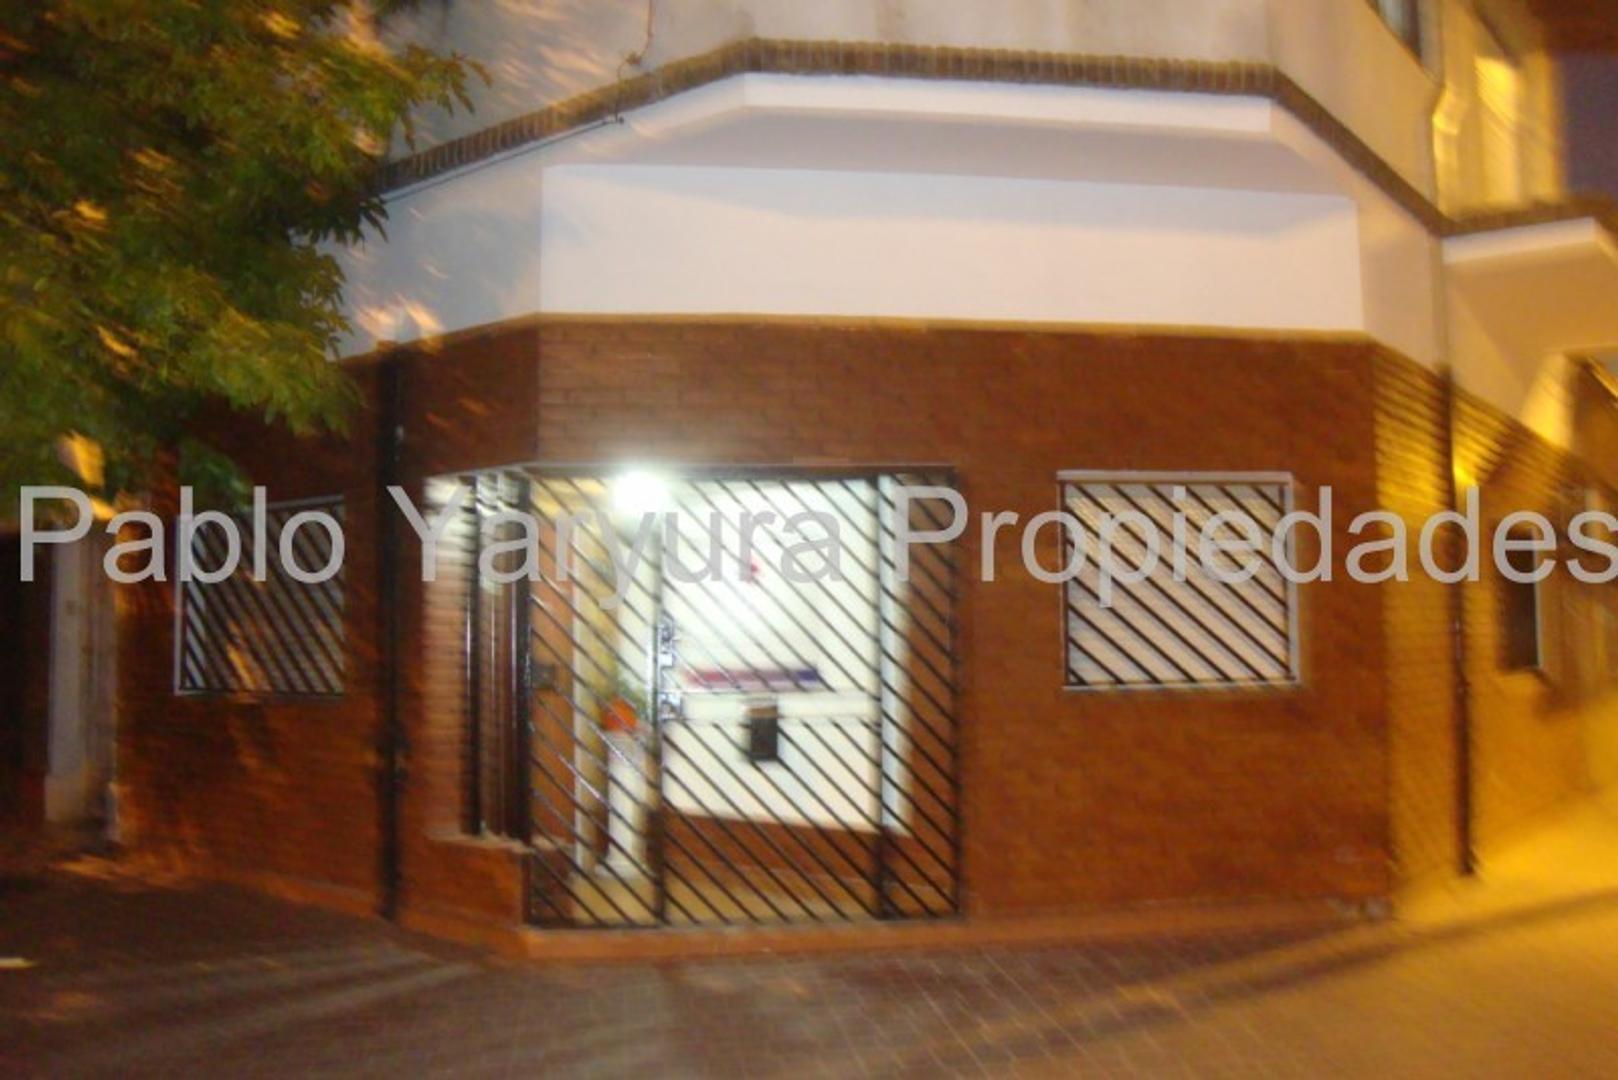 XINTEL(YAR-YA1-13727) Departamento Tipo Casa - Venta - Argentina, Tres de Febrero - MITRE AV 5047